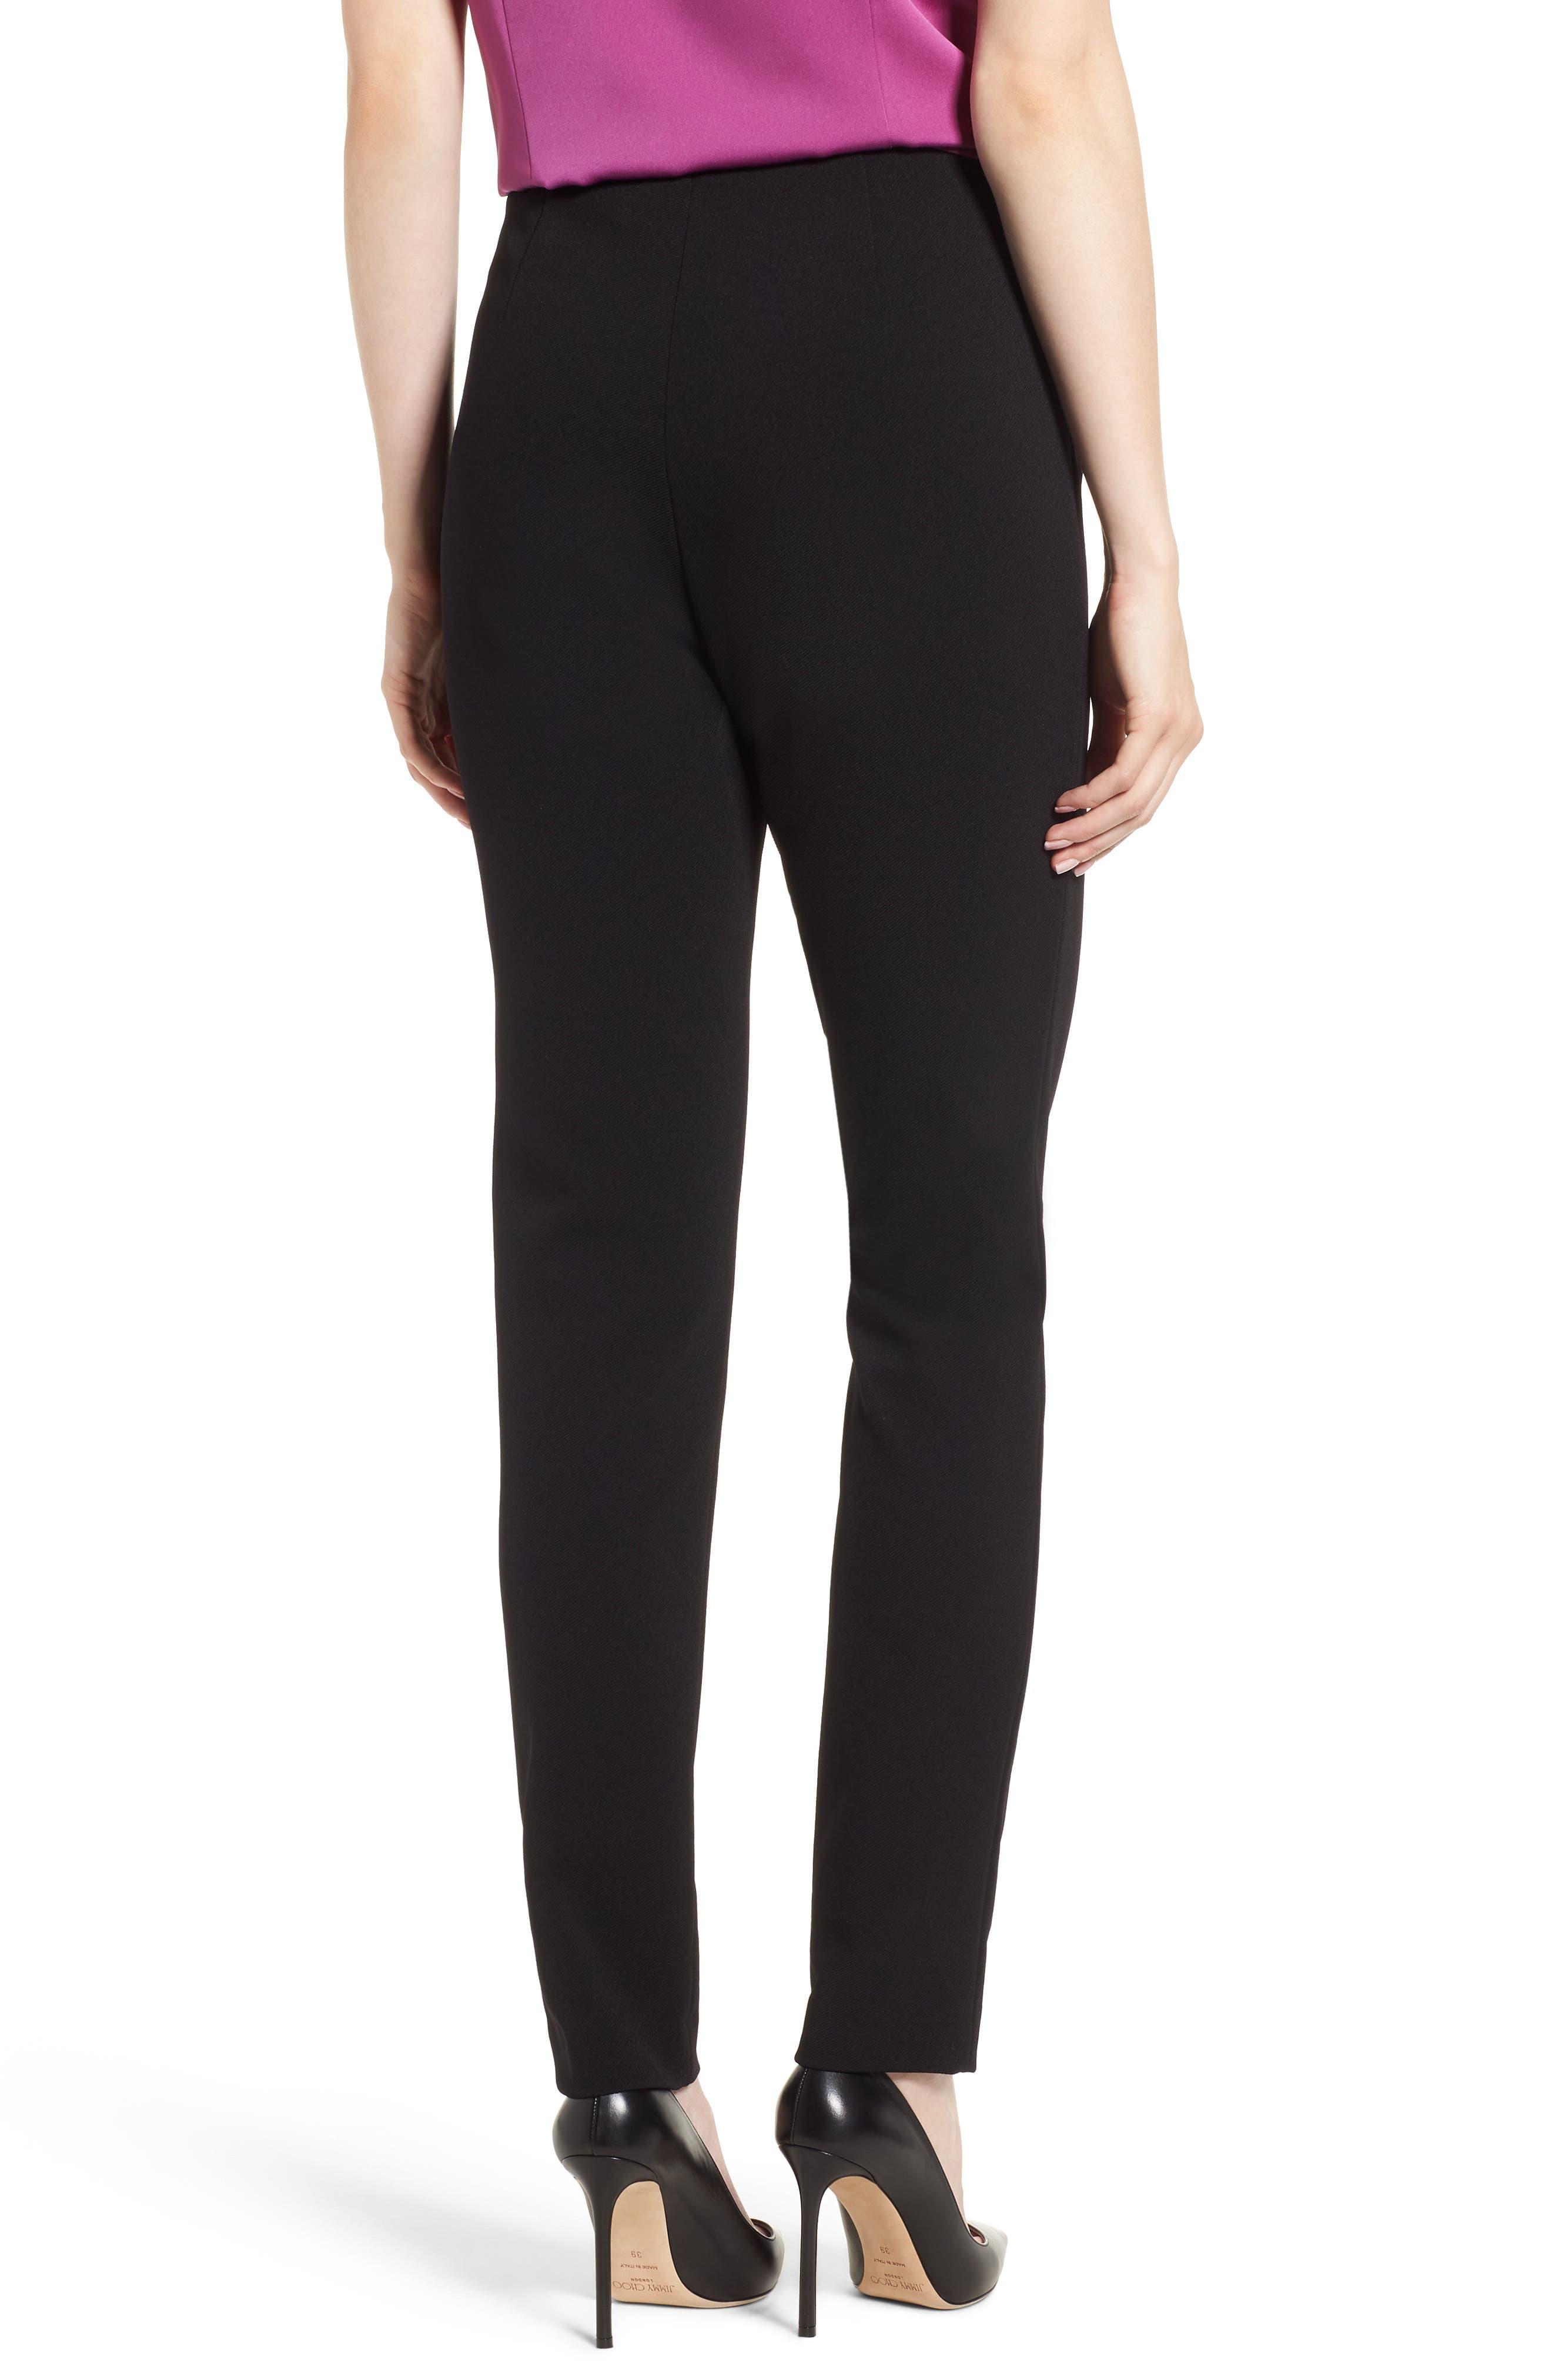 Tilezea Twill Jersey Trousers,                             Alternate thumbnail 2, color,                             Black